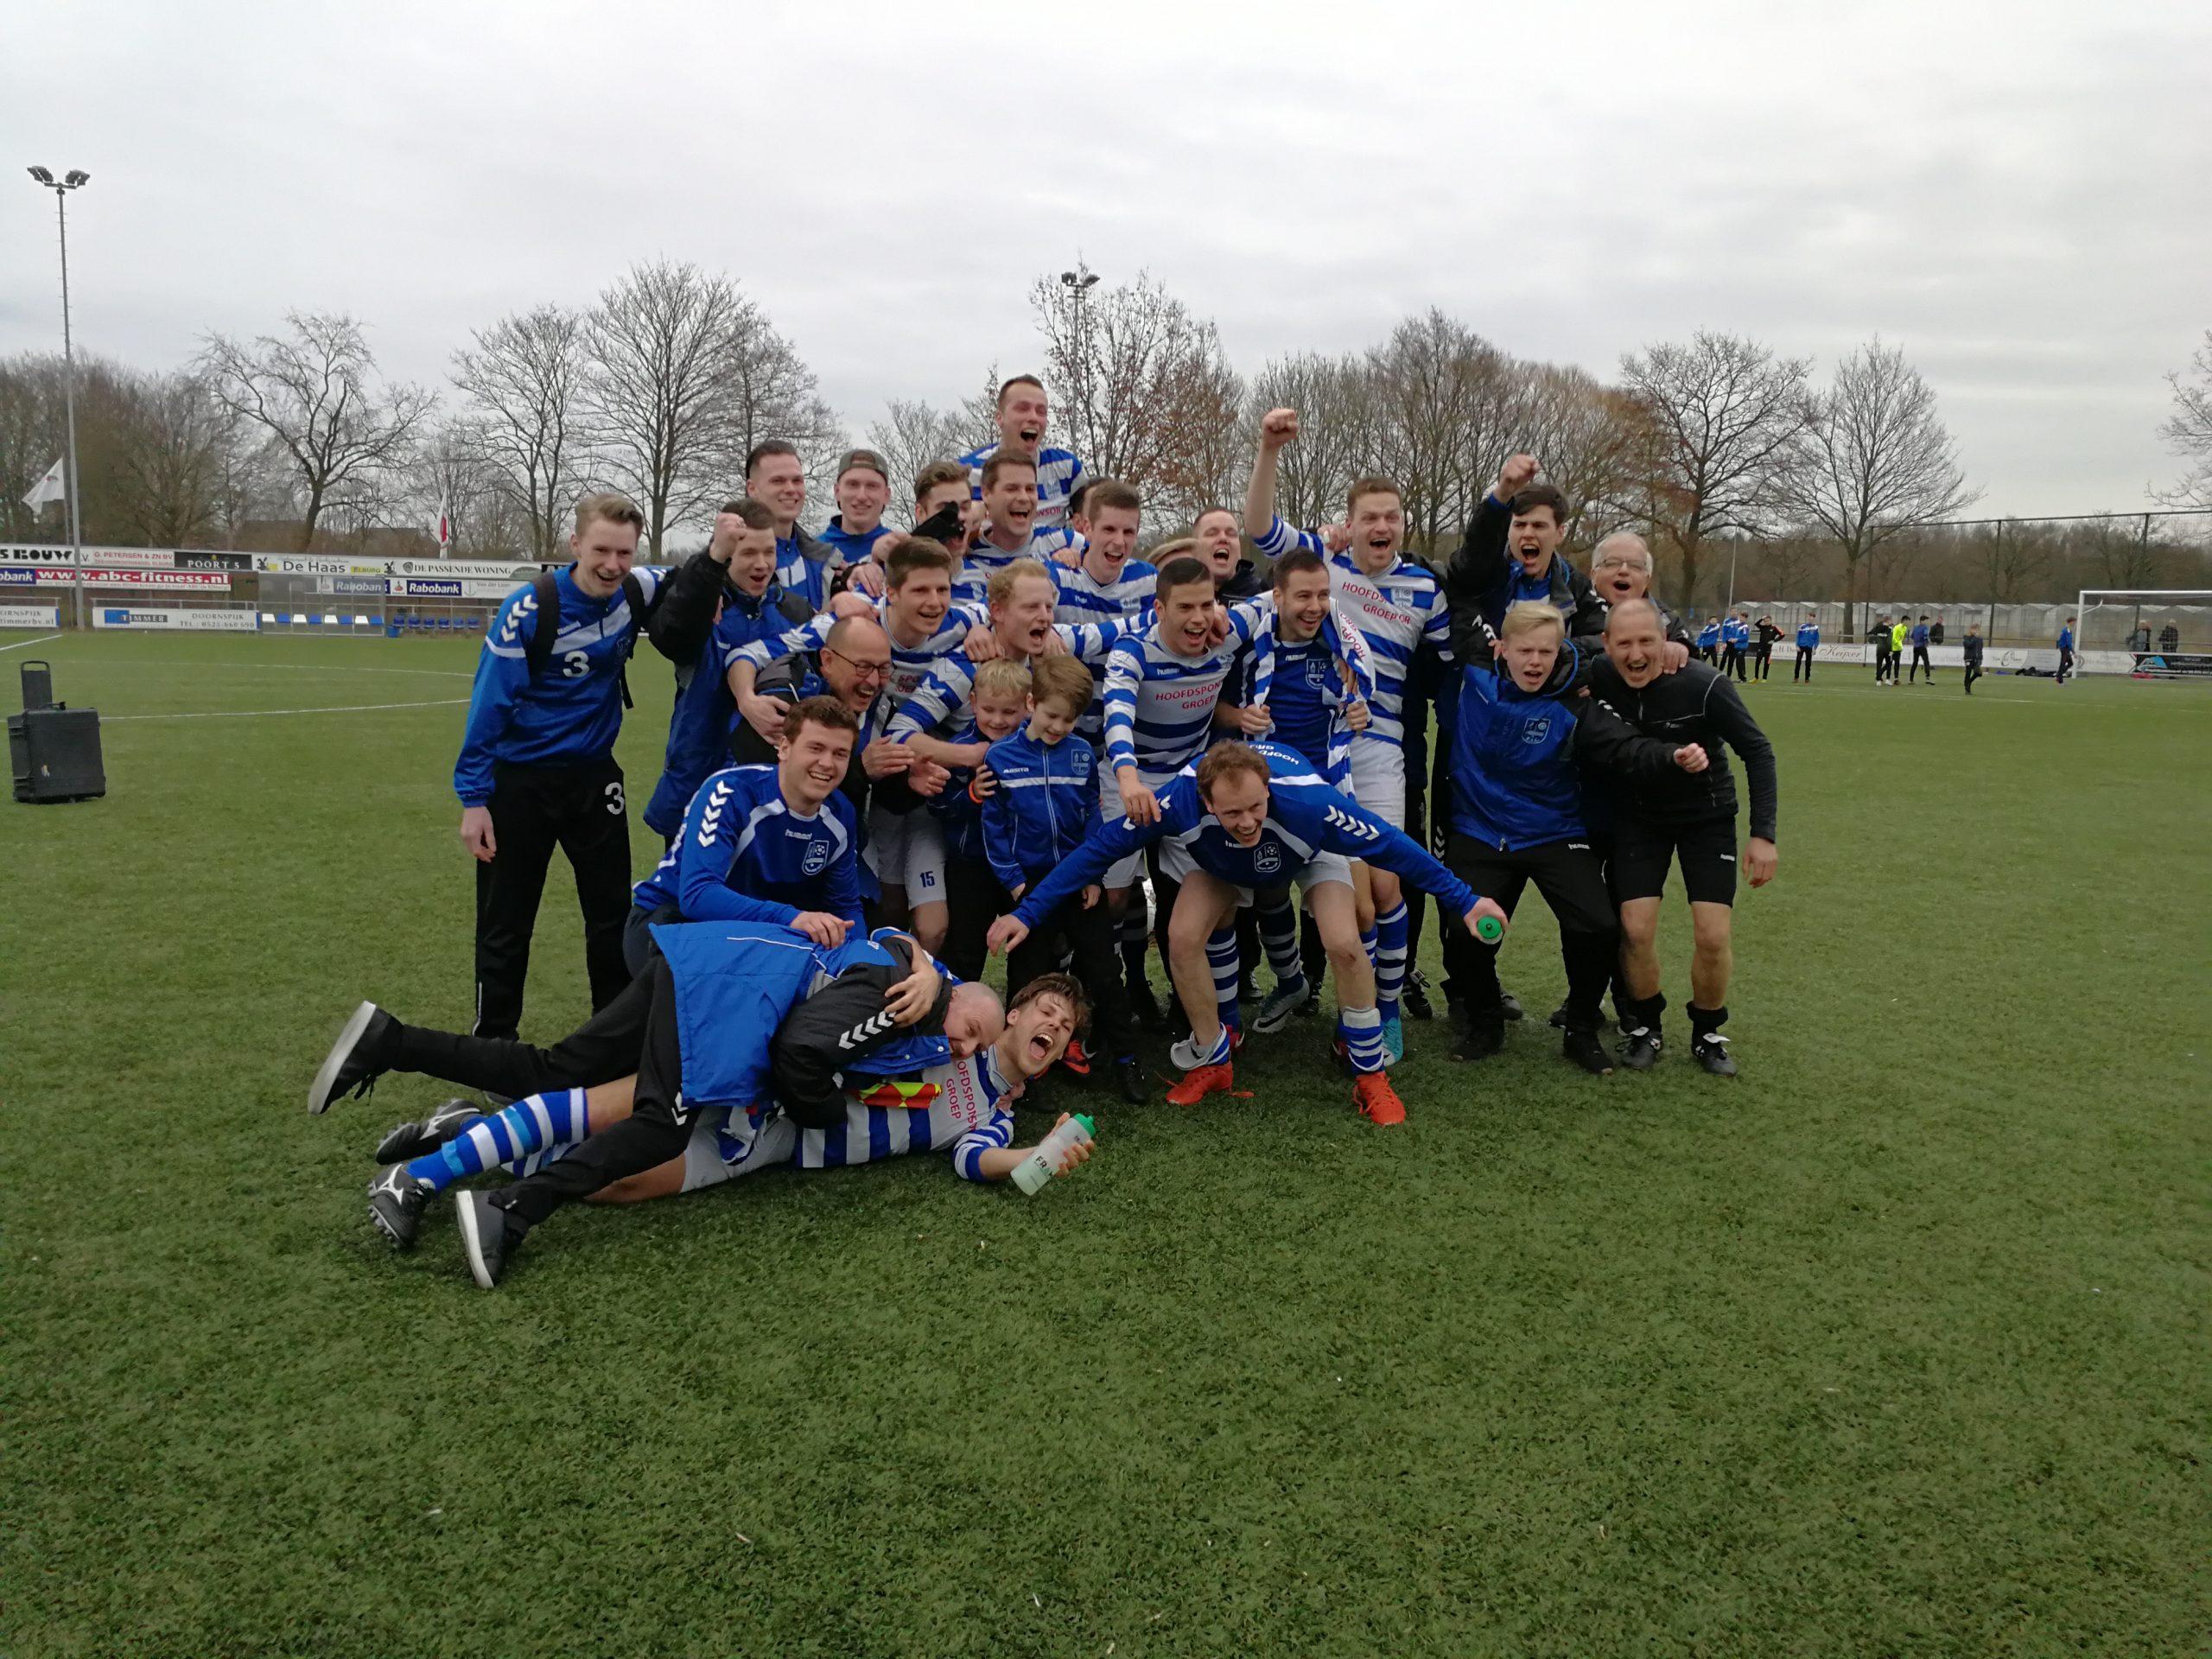 Periode-titel voor Elburger Sportclub in extremis - Elburger SC